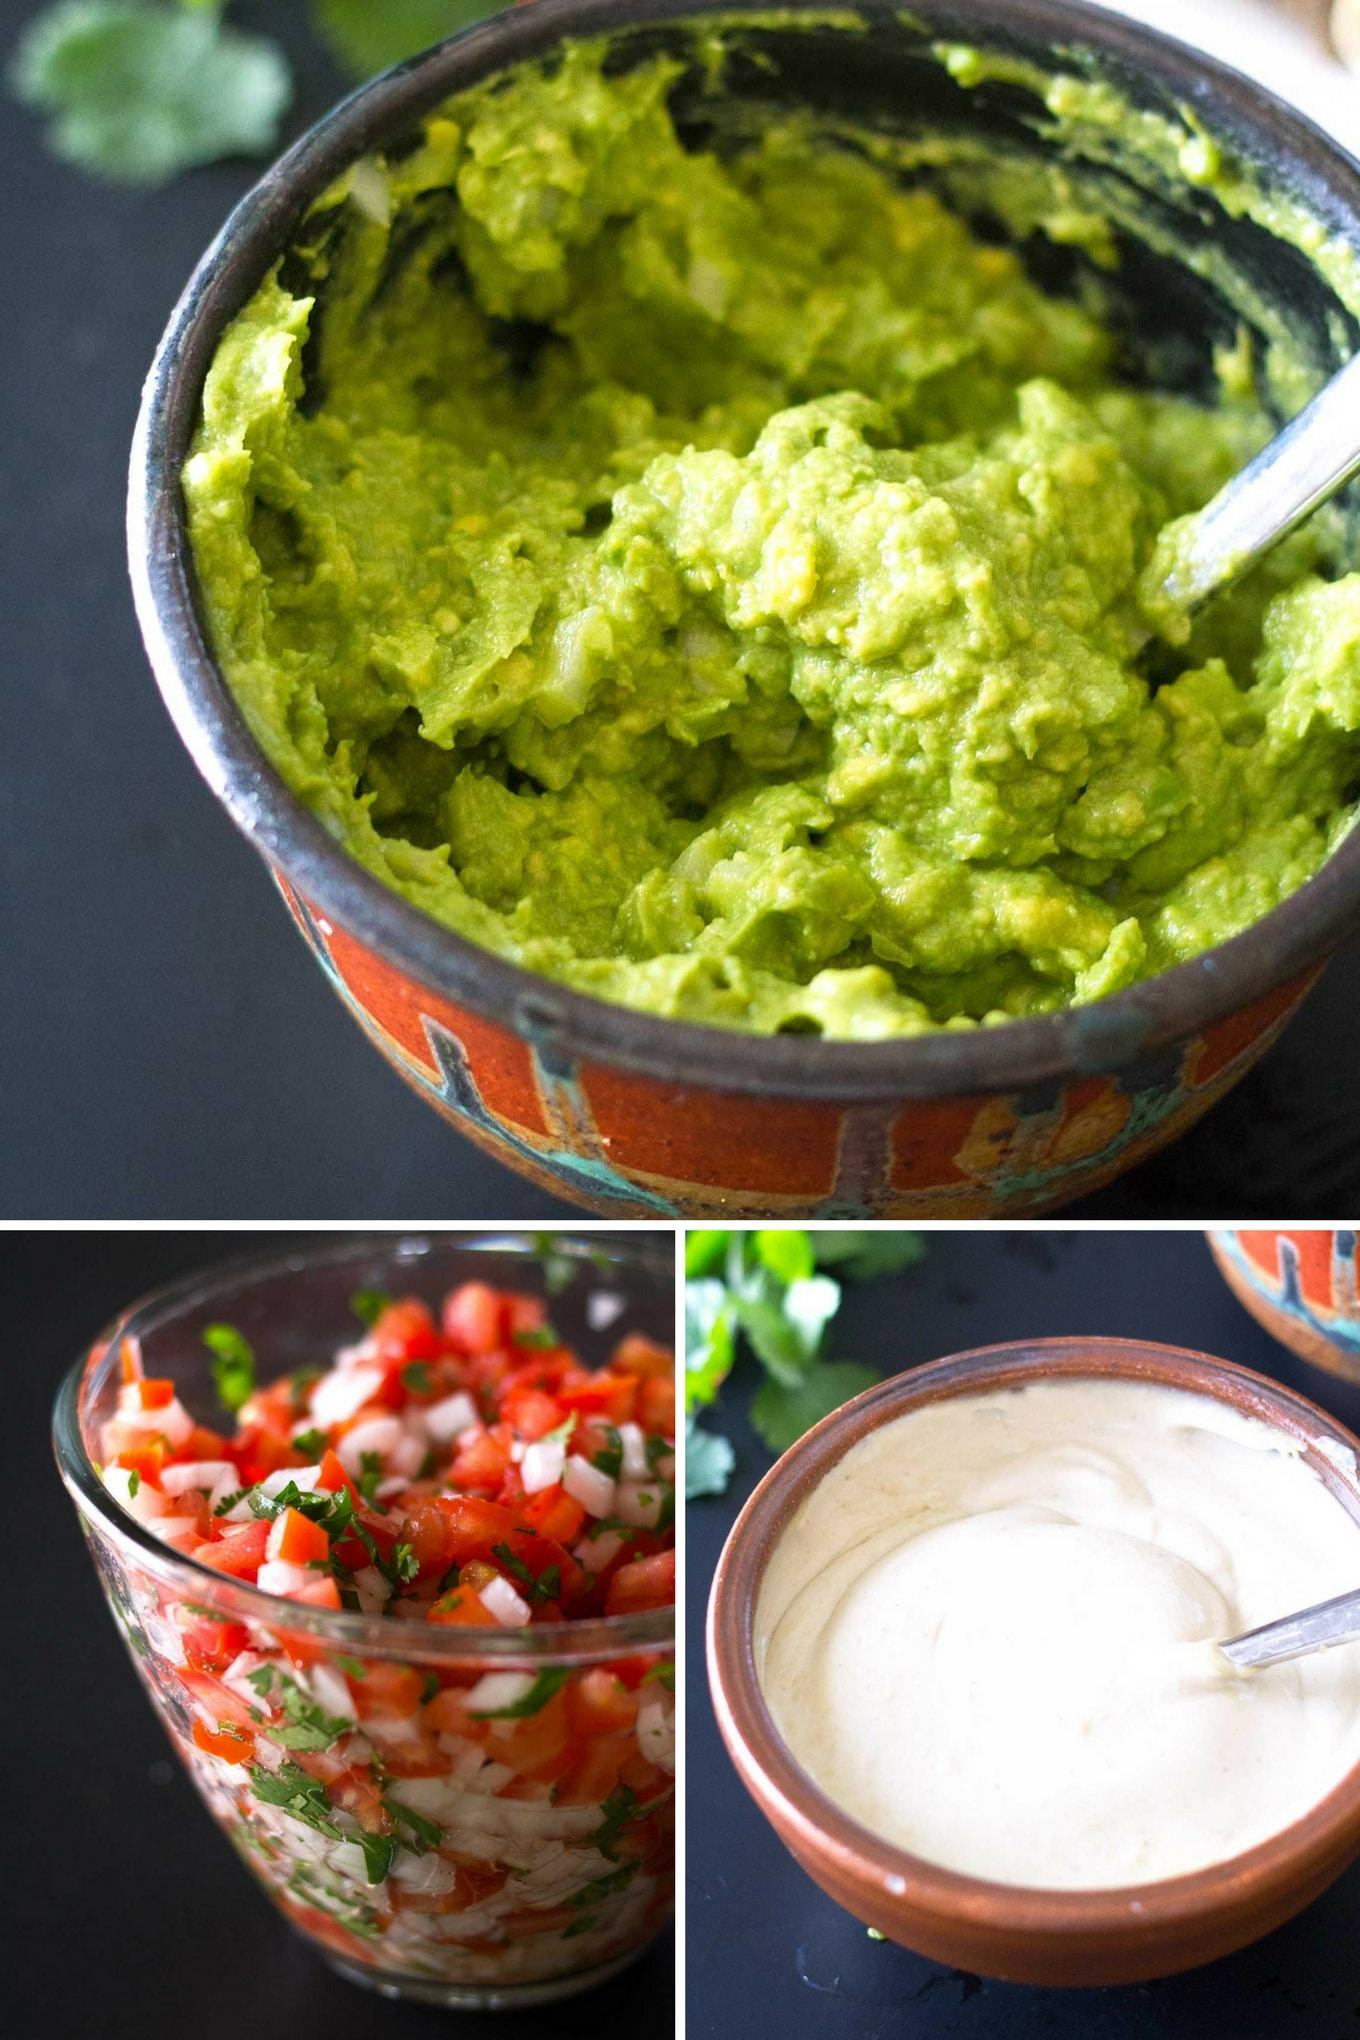 Ultimate Vegan Fajitas | Toppings such as guacamole, pico de gallo, savory cashew cream | http://www.eatwithinyourmeans.com/